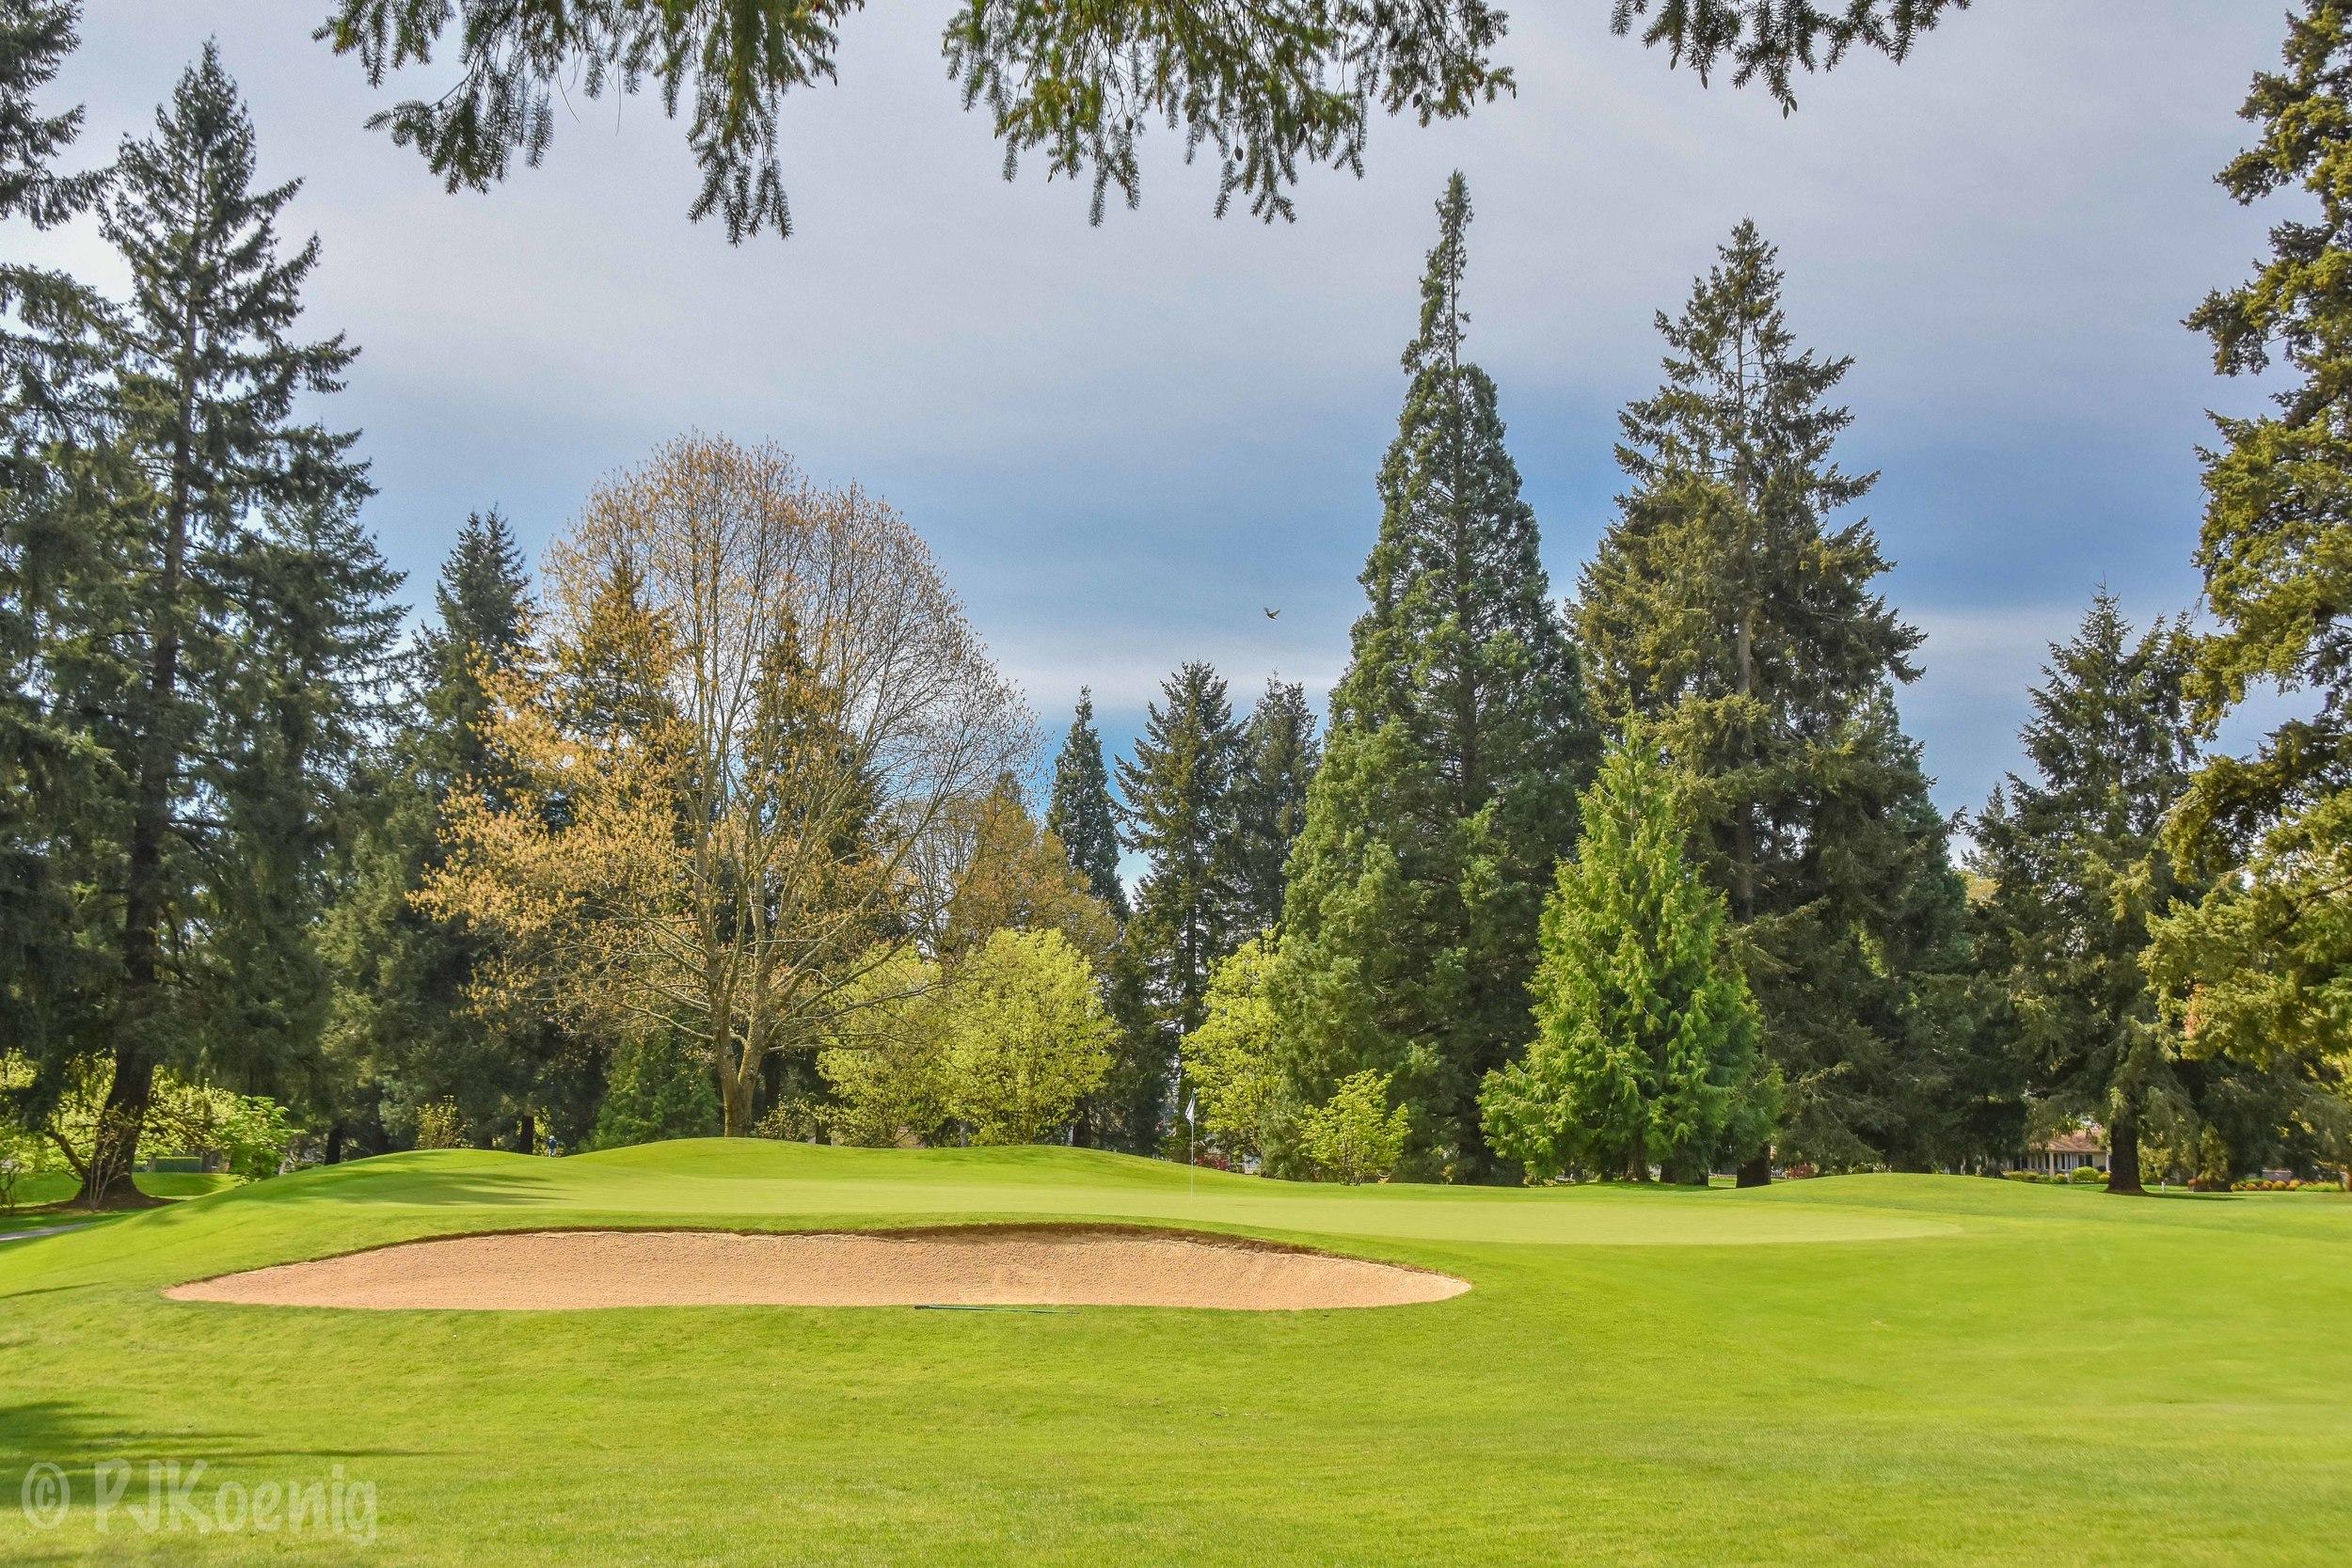 Royal Oaks Country Club - Vancouver, WA